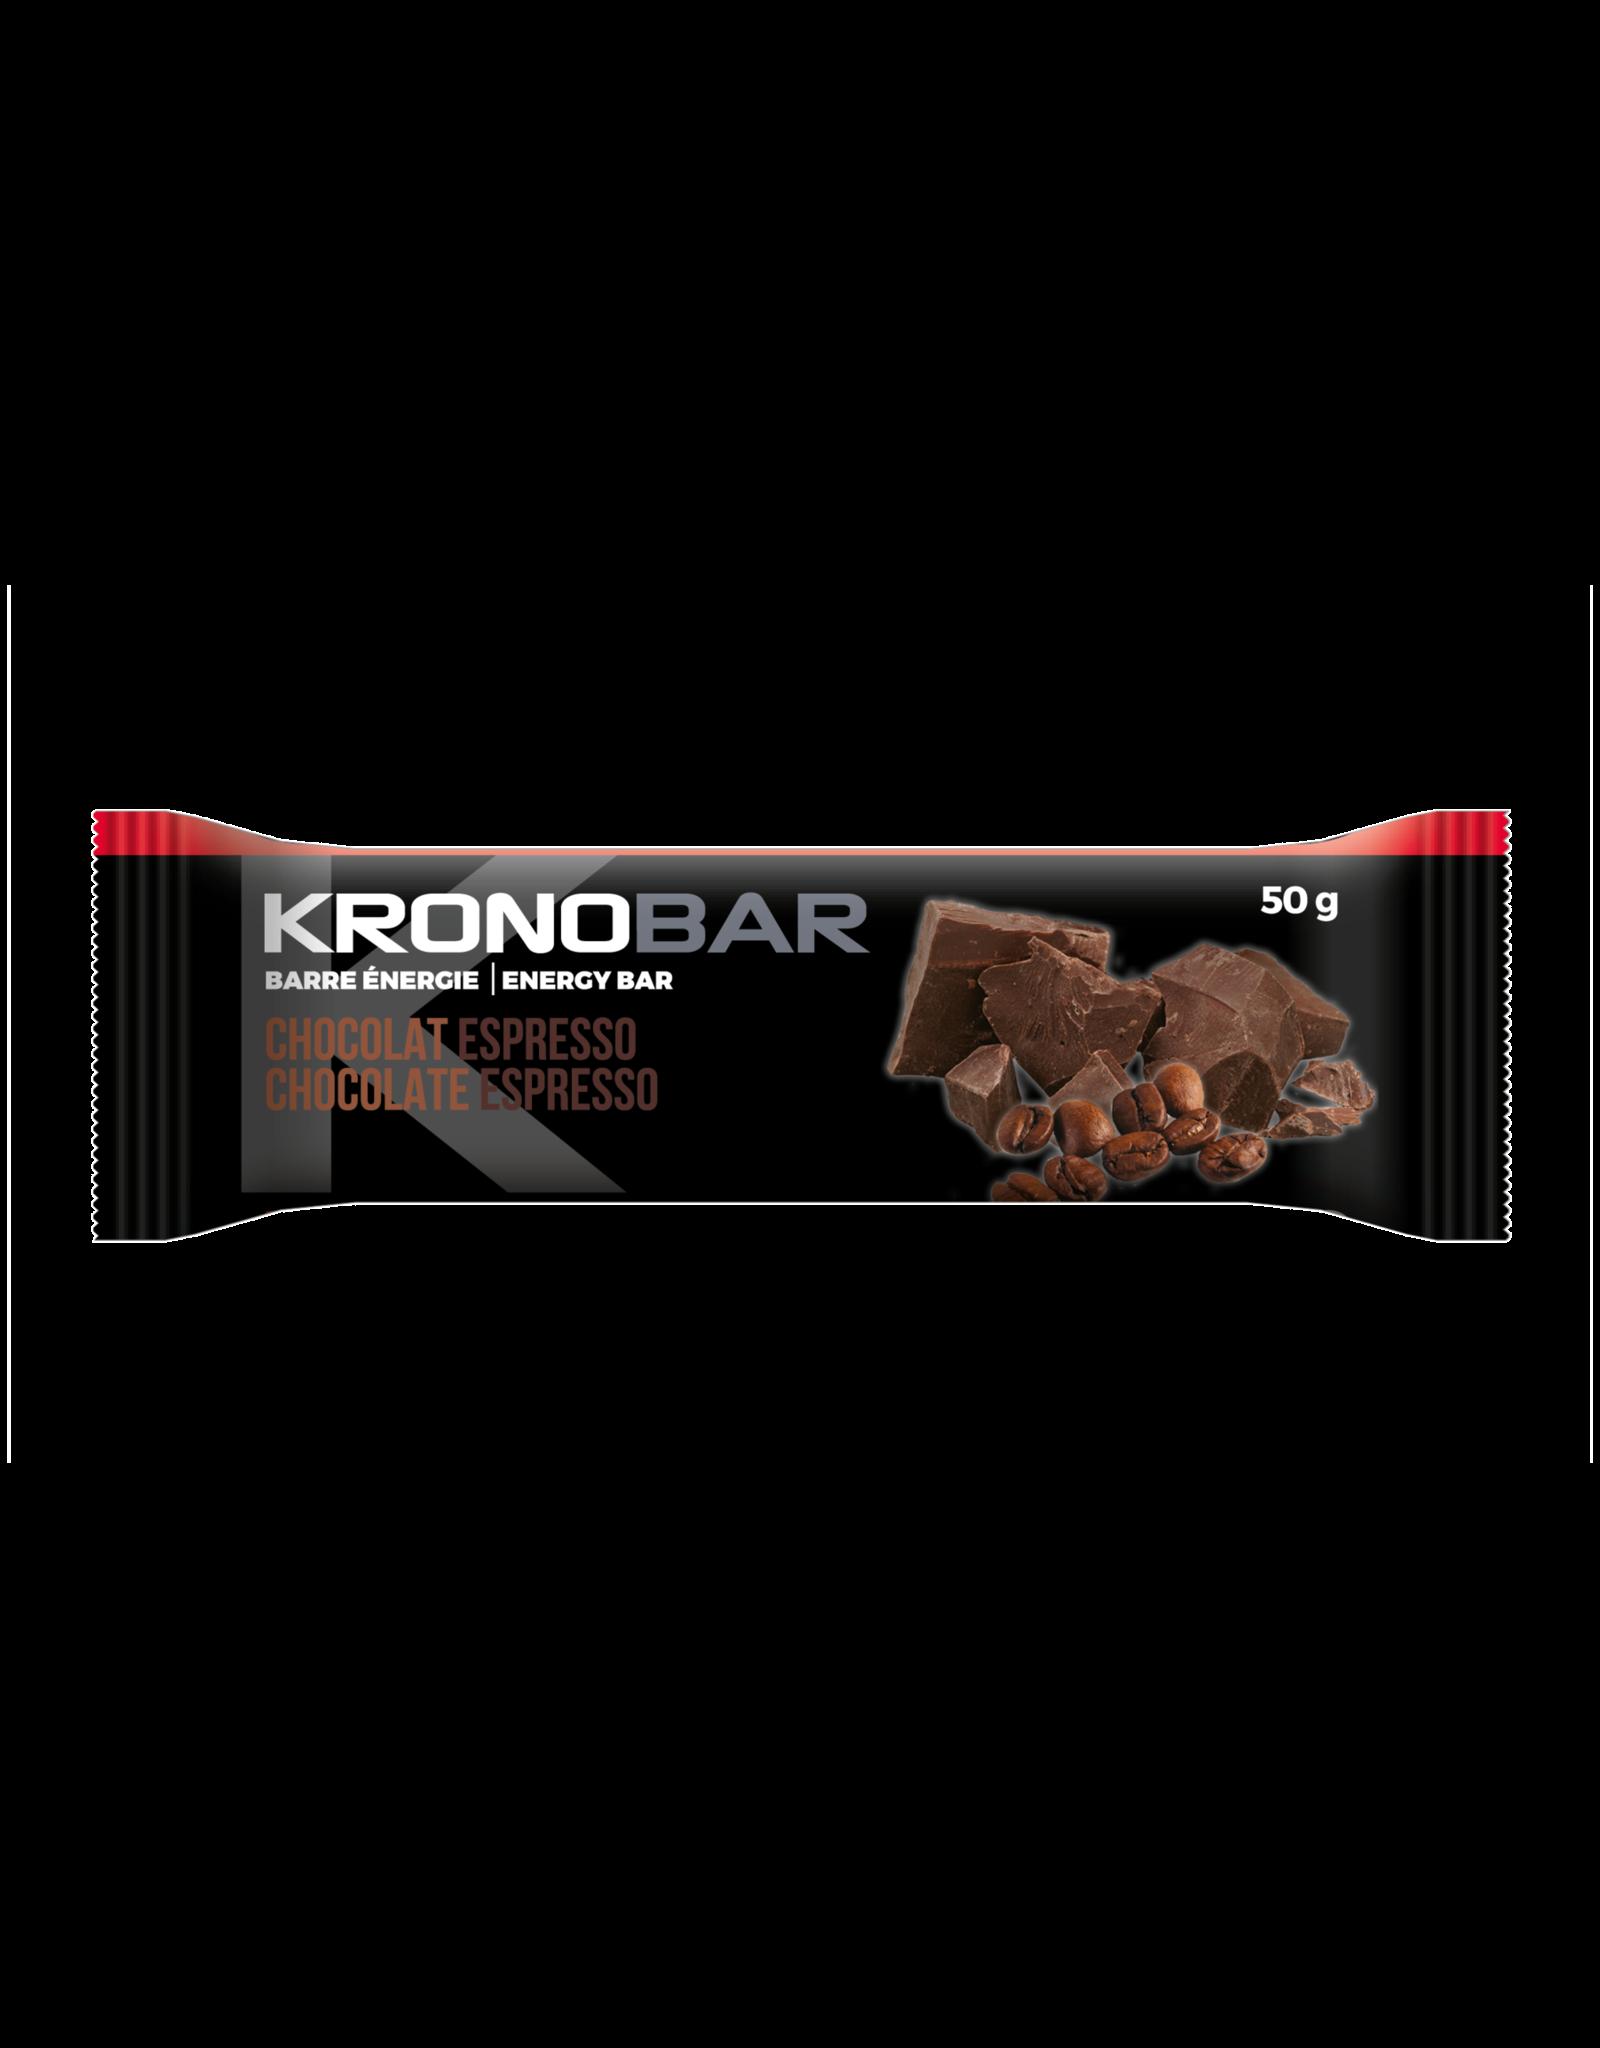 Kronobar Barre Kronobar énergétique (50g)